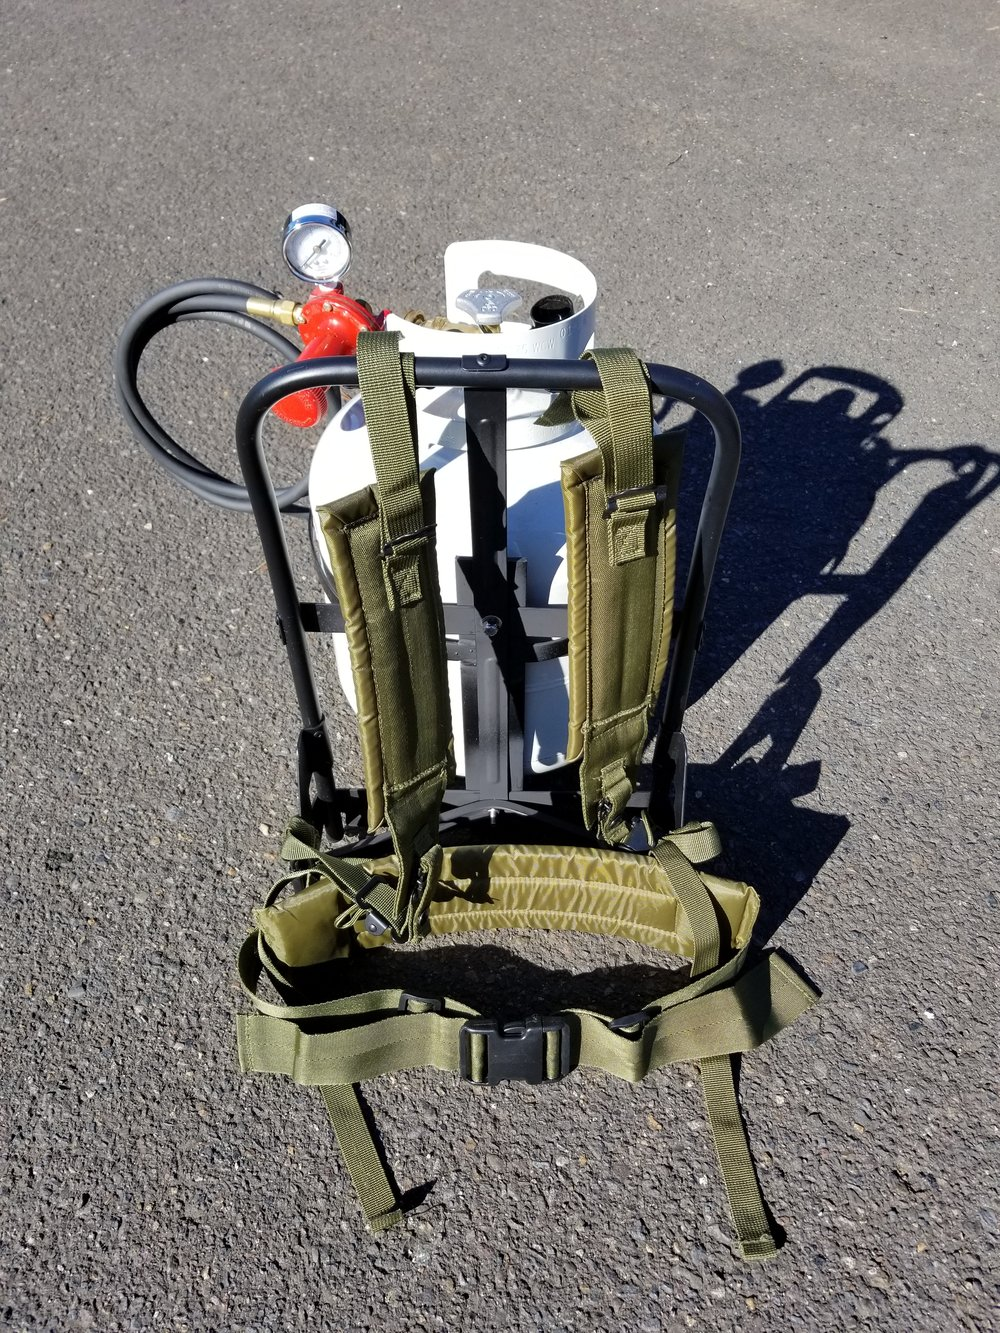 Backpack Package (Round Basket) - $369